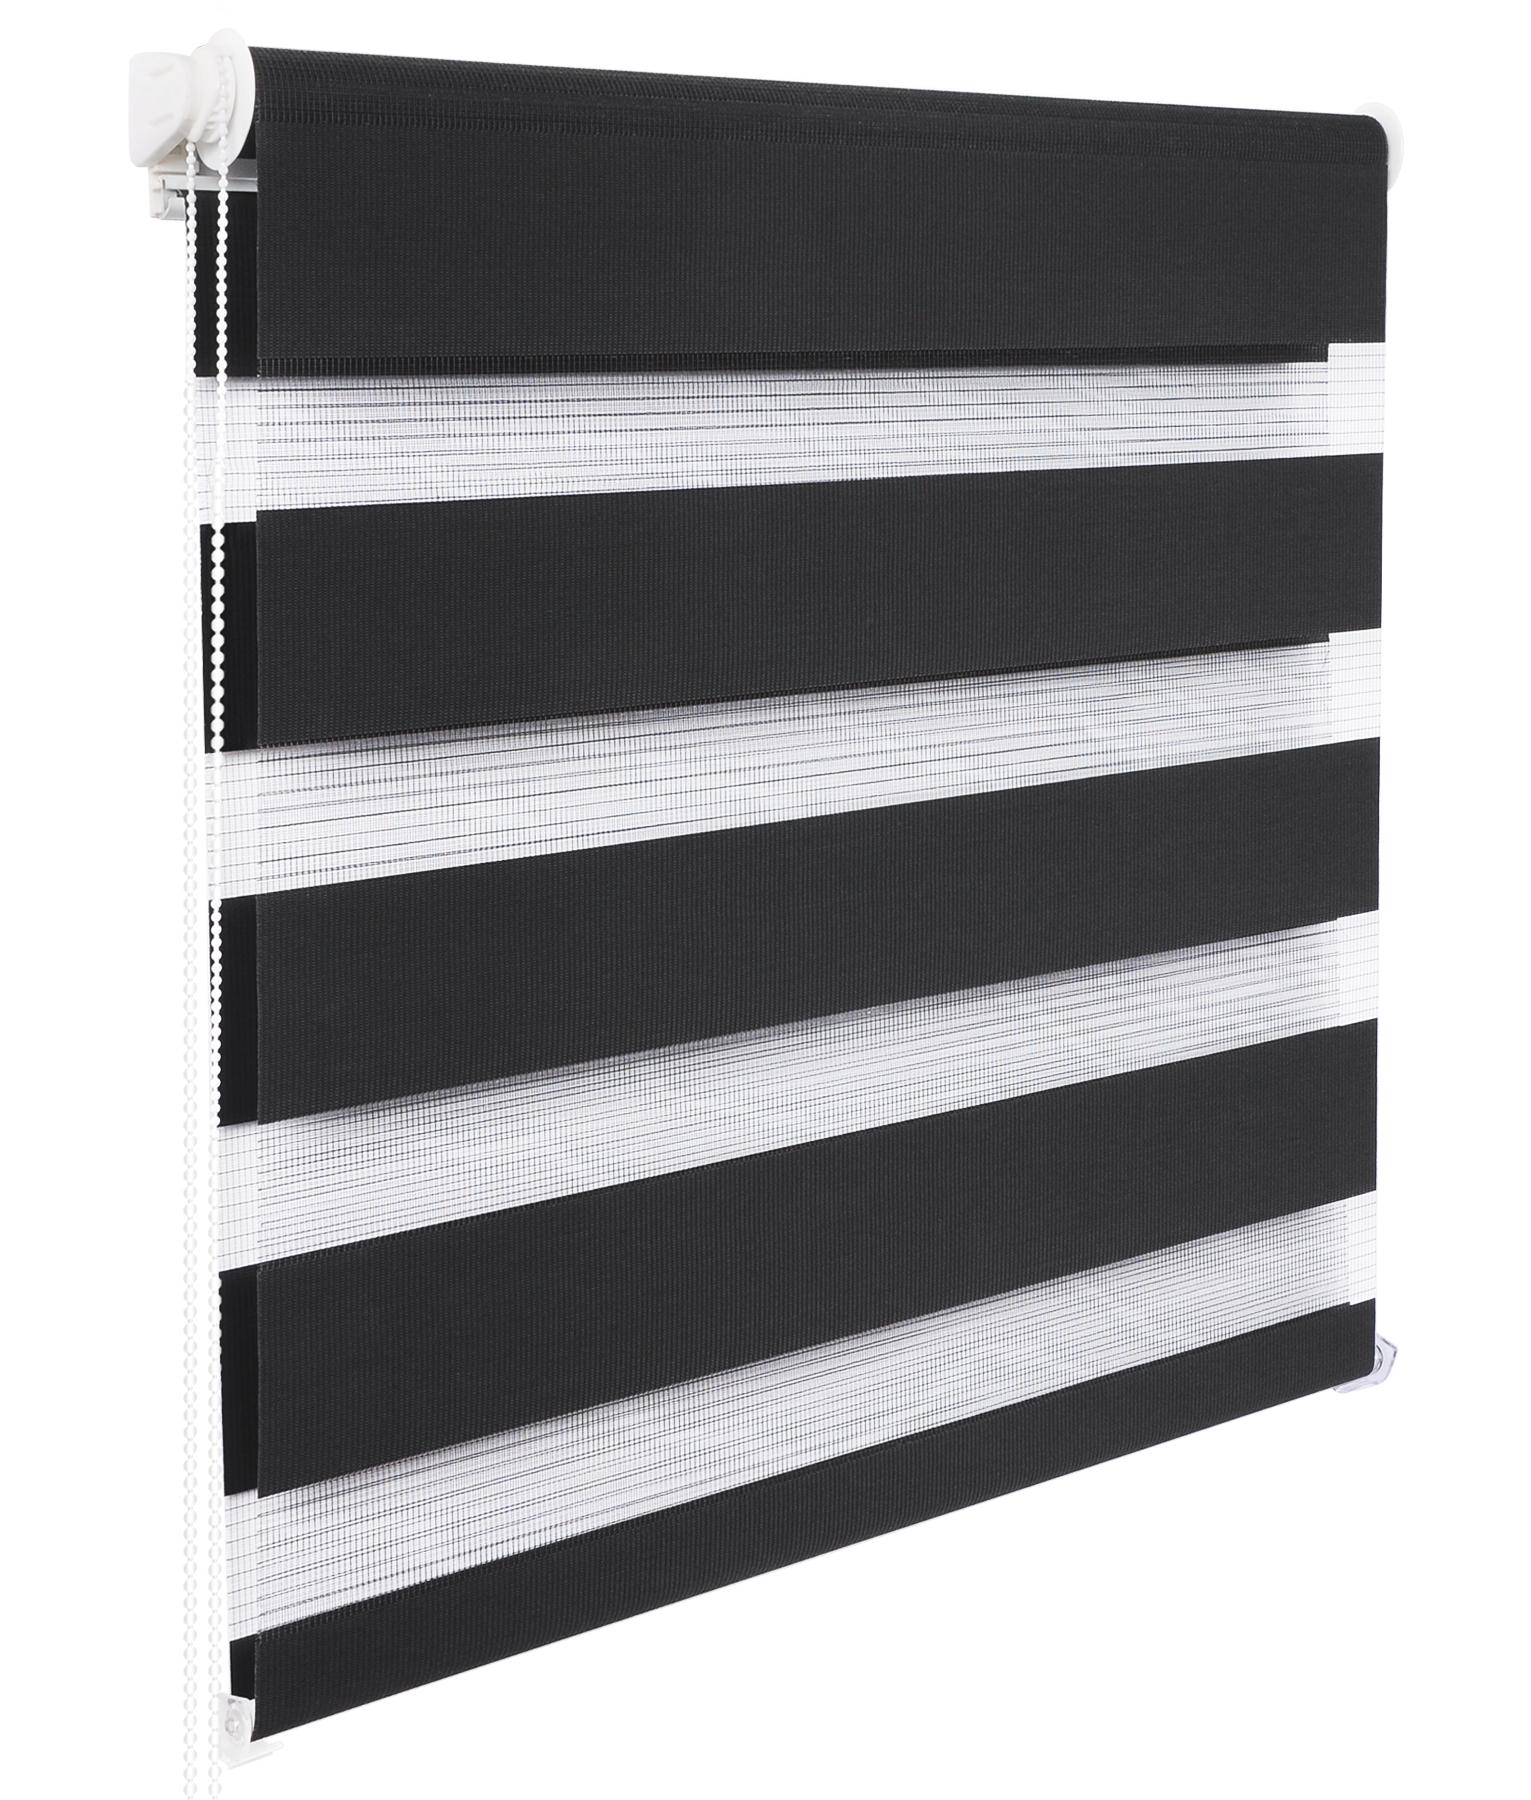 doppelrollo duo rollo klemmfix ohne bohren seitenzugrollo vario anthrazit 324 6. Black Bedroom Furniture Sets. Home Design Ideas